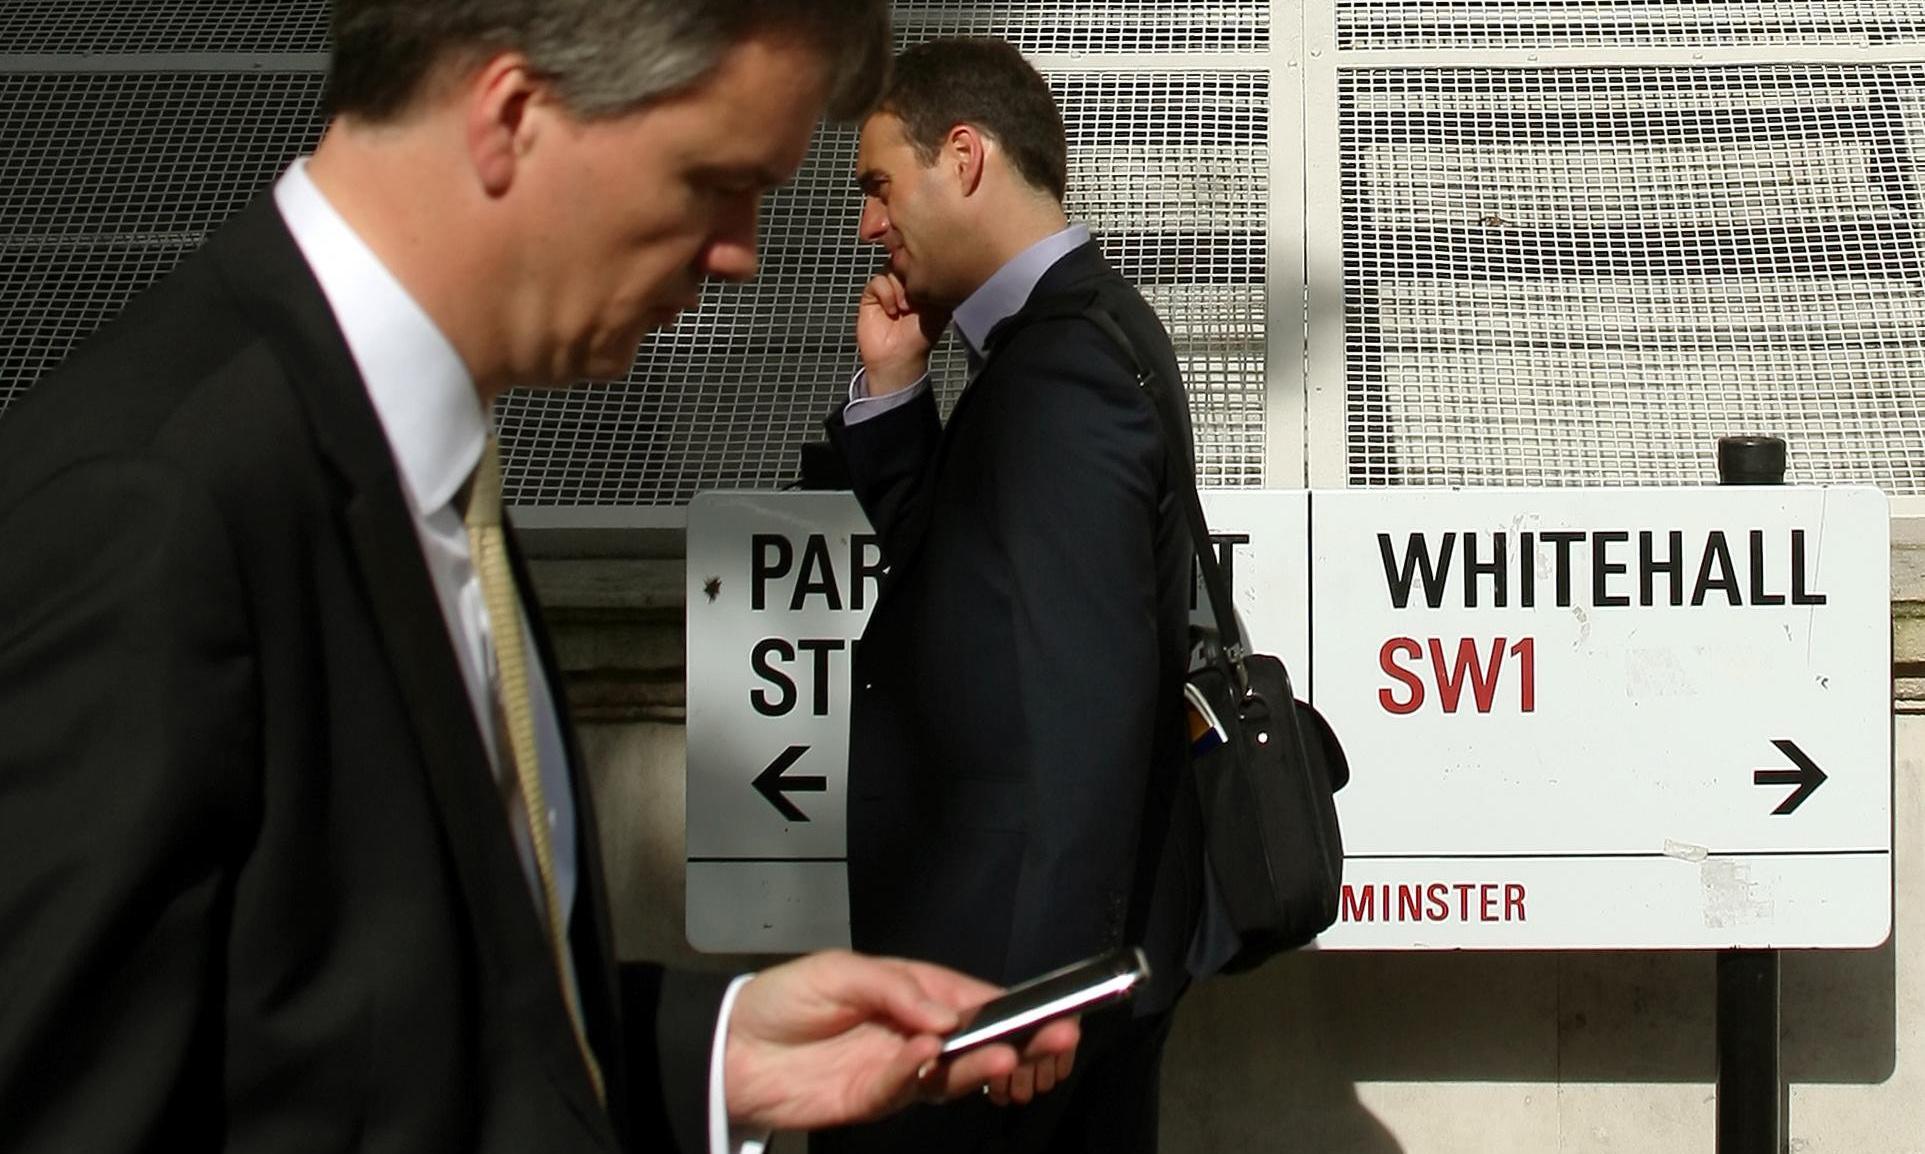 I'm a civil servant – and we can't make Boris Johnson's no-deal fantasy into reality